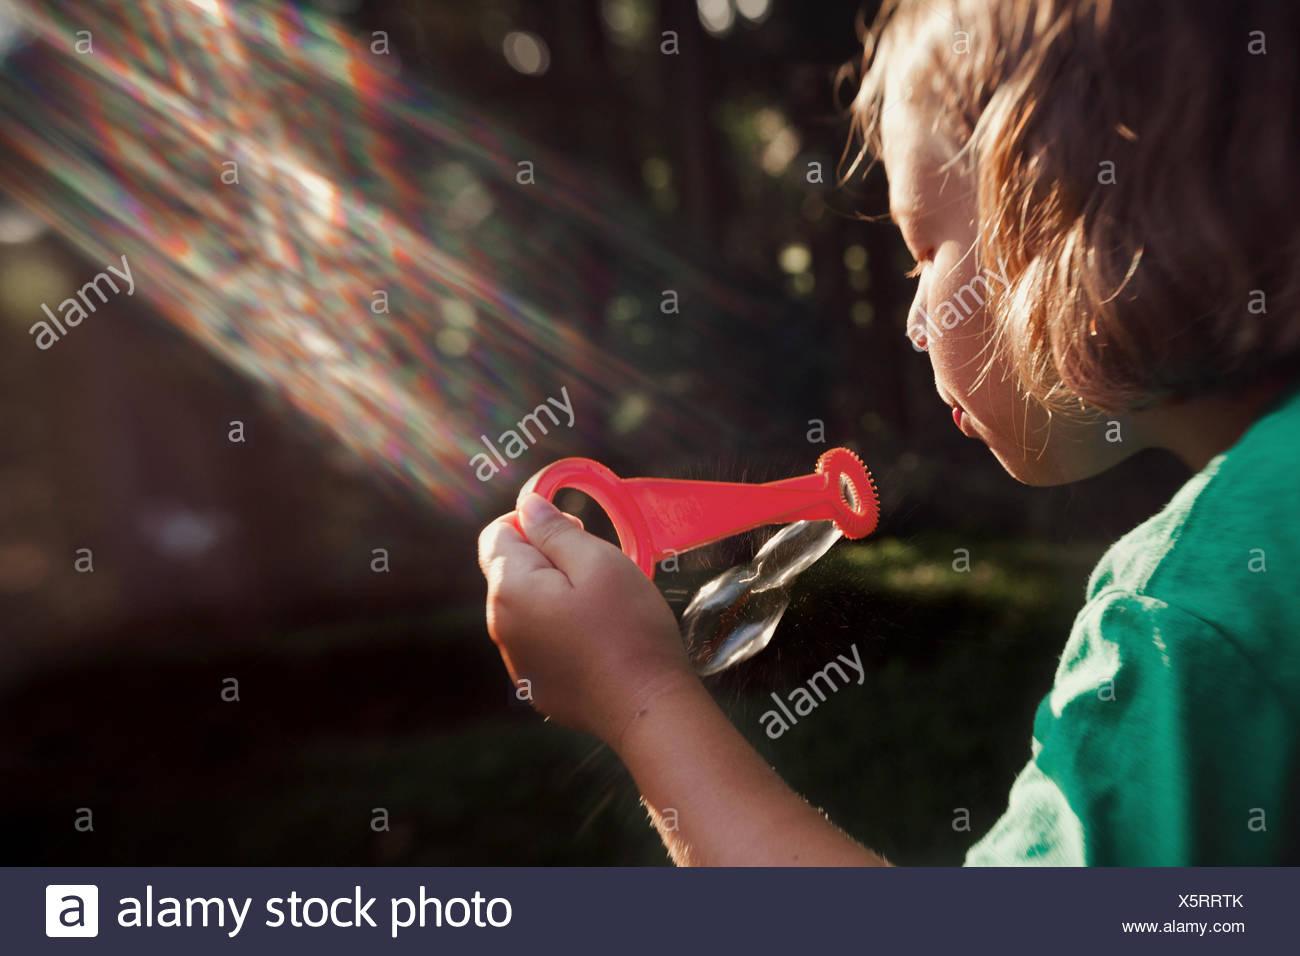 Chica (8-9) soplando burbujas Imagen De Stock